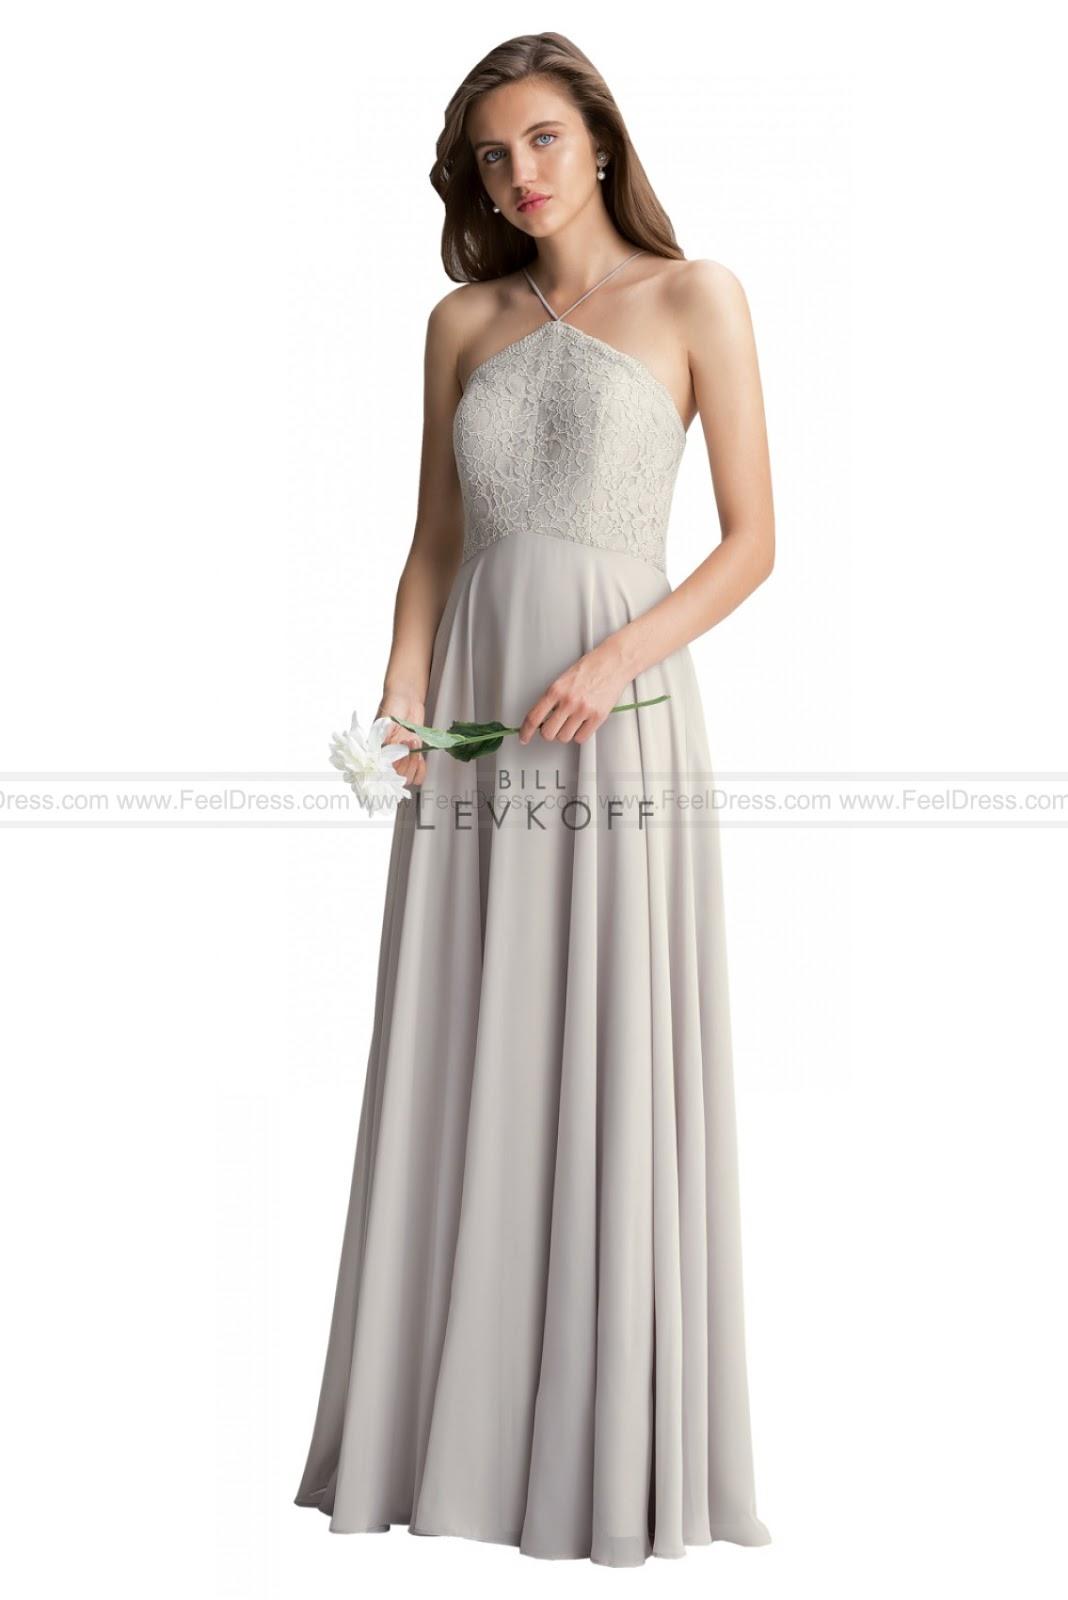 a96f63f1f78d 2016 cheap wedding dresses: Bill Levkoff Bridesmaid Dresses lace ...